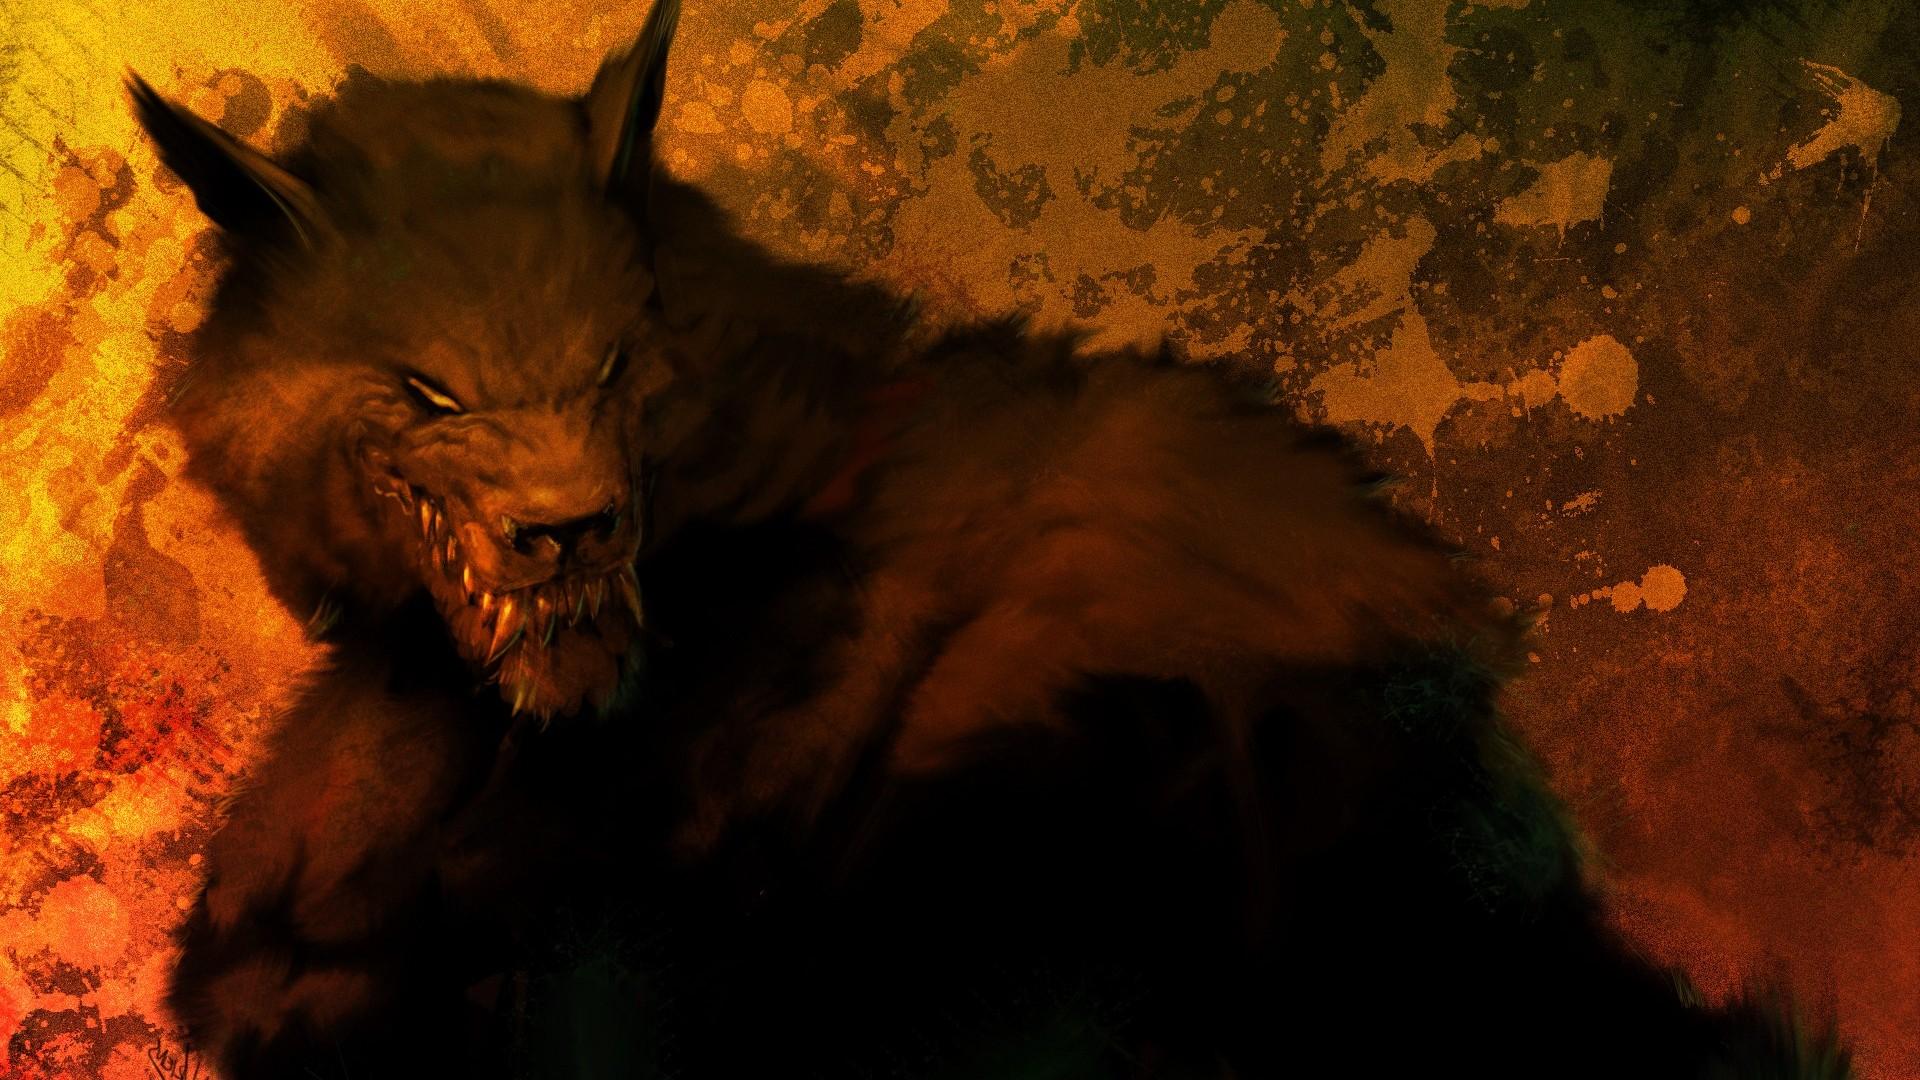 1920 X 1080 Werewolf Wallpapers Wallpapersafari